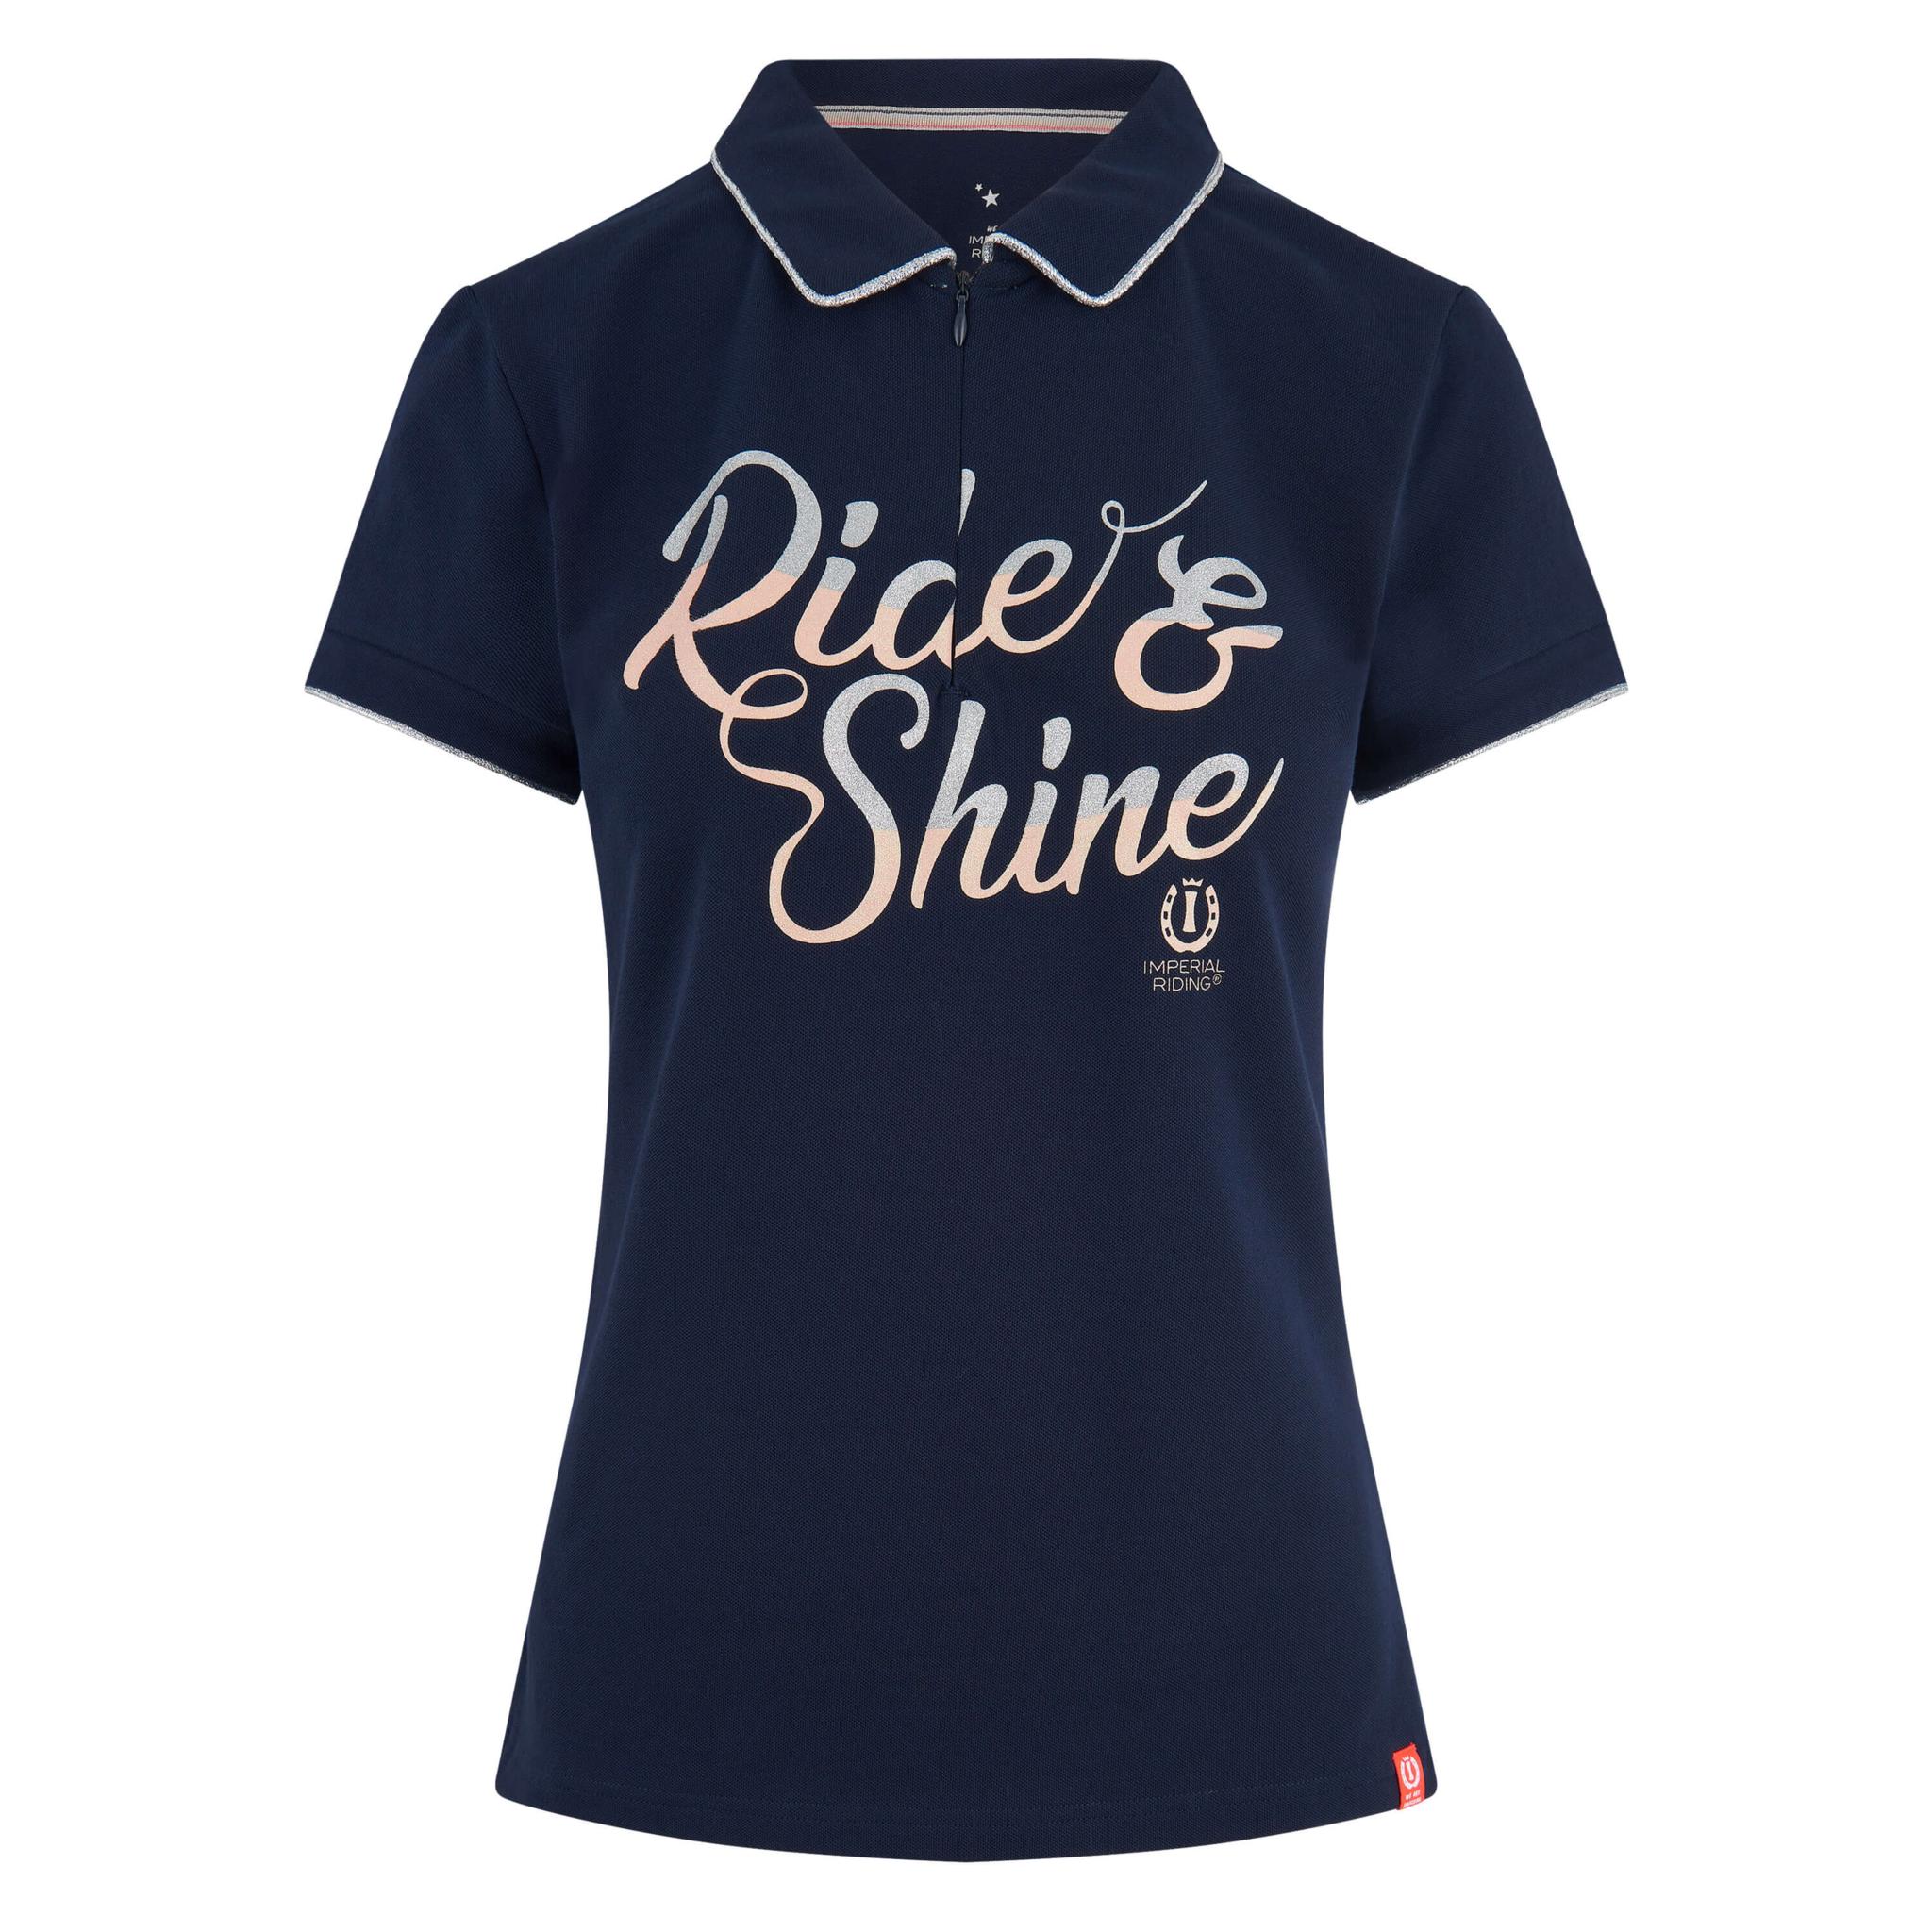 IMPERIAL RIDING Romance polo ride&shine navy